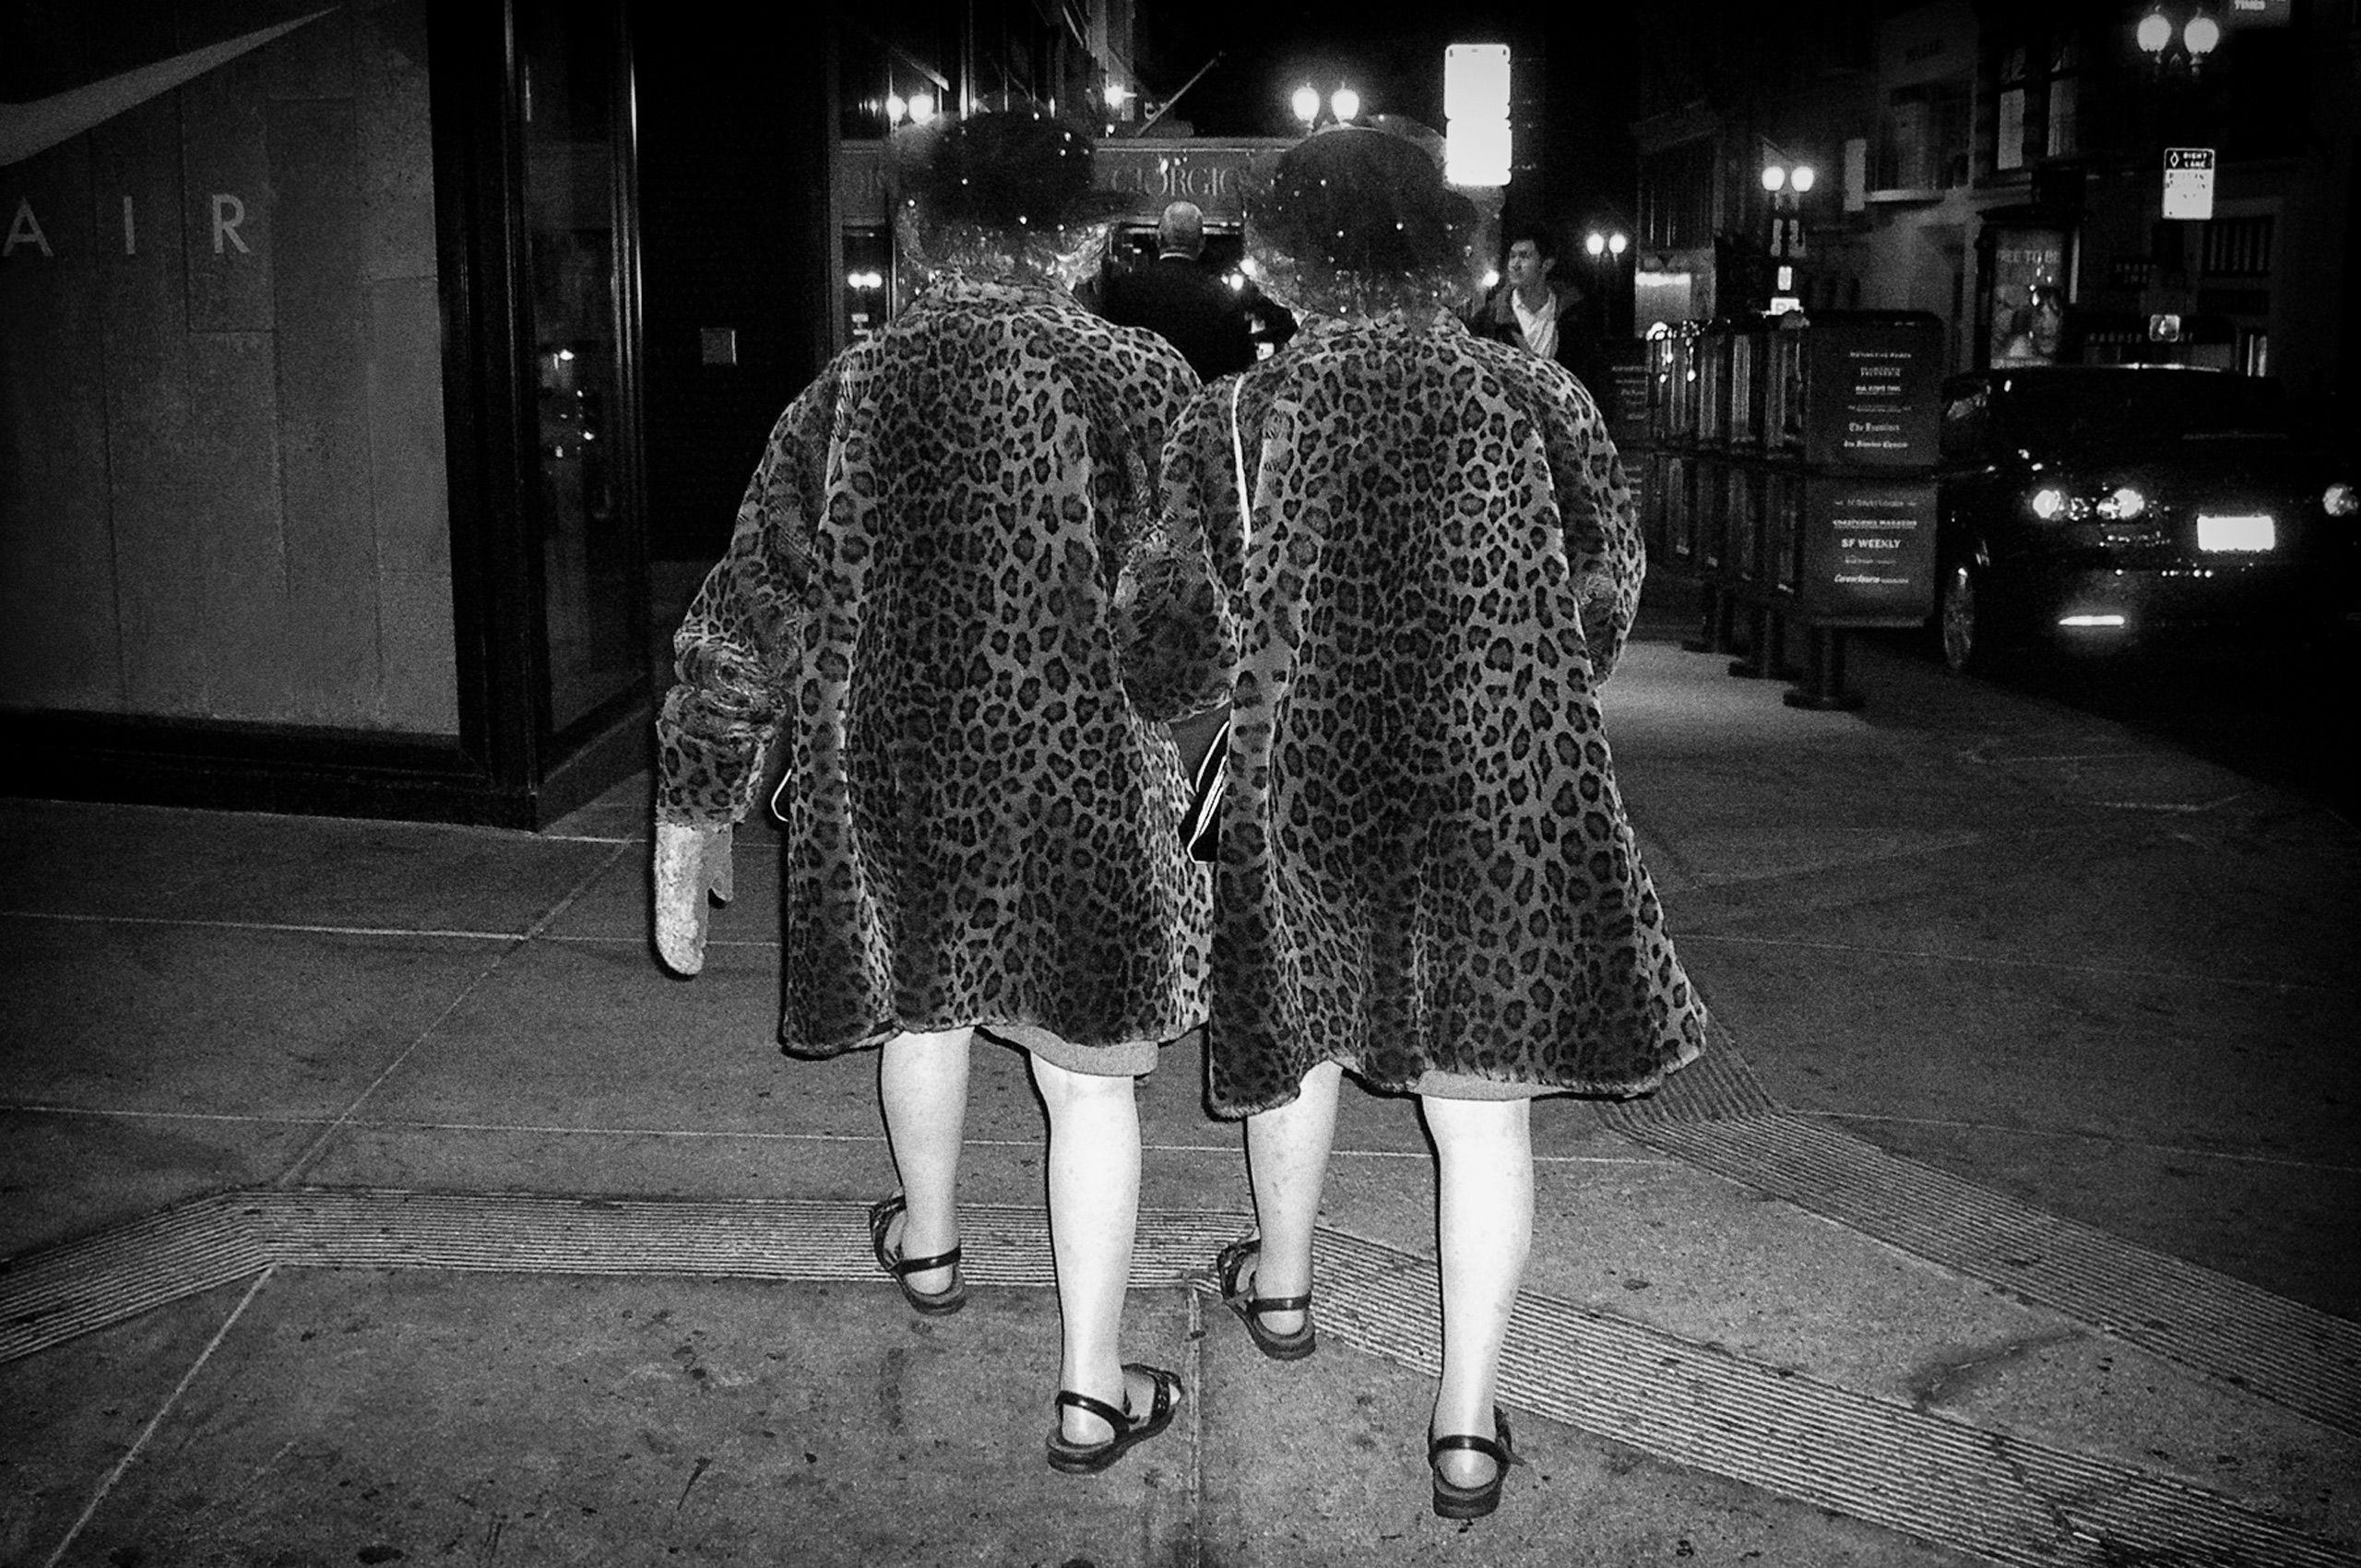 CIMG2484-Twins.jpg